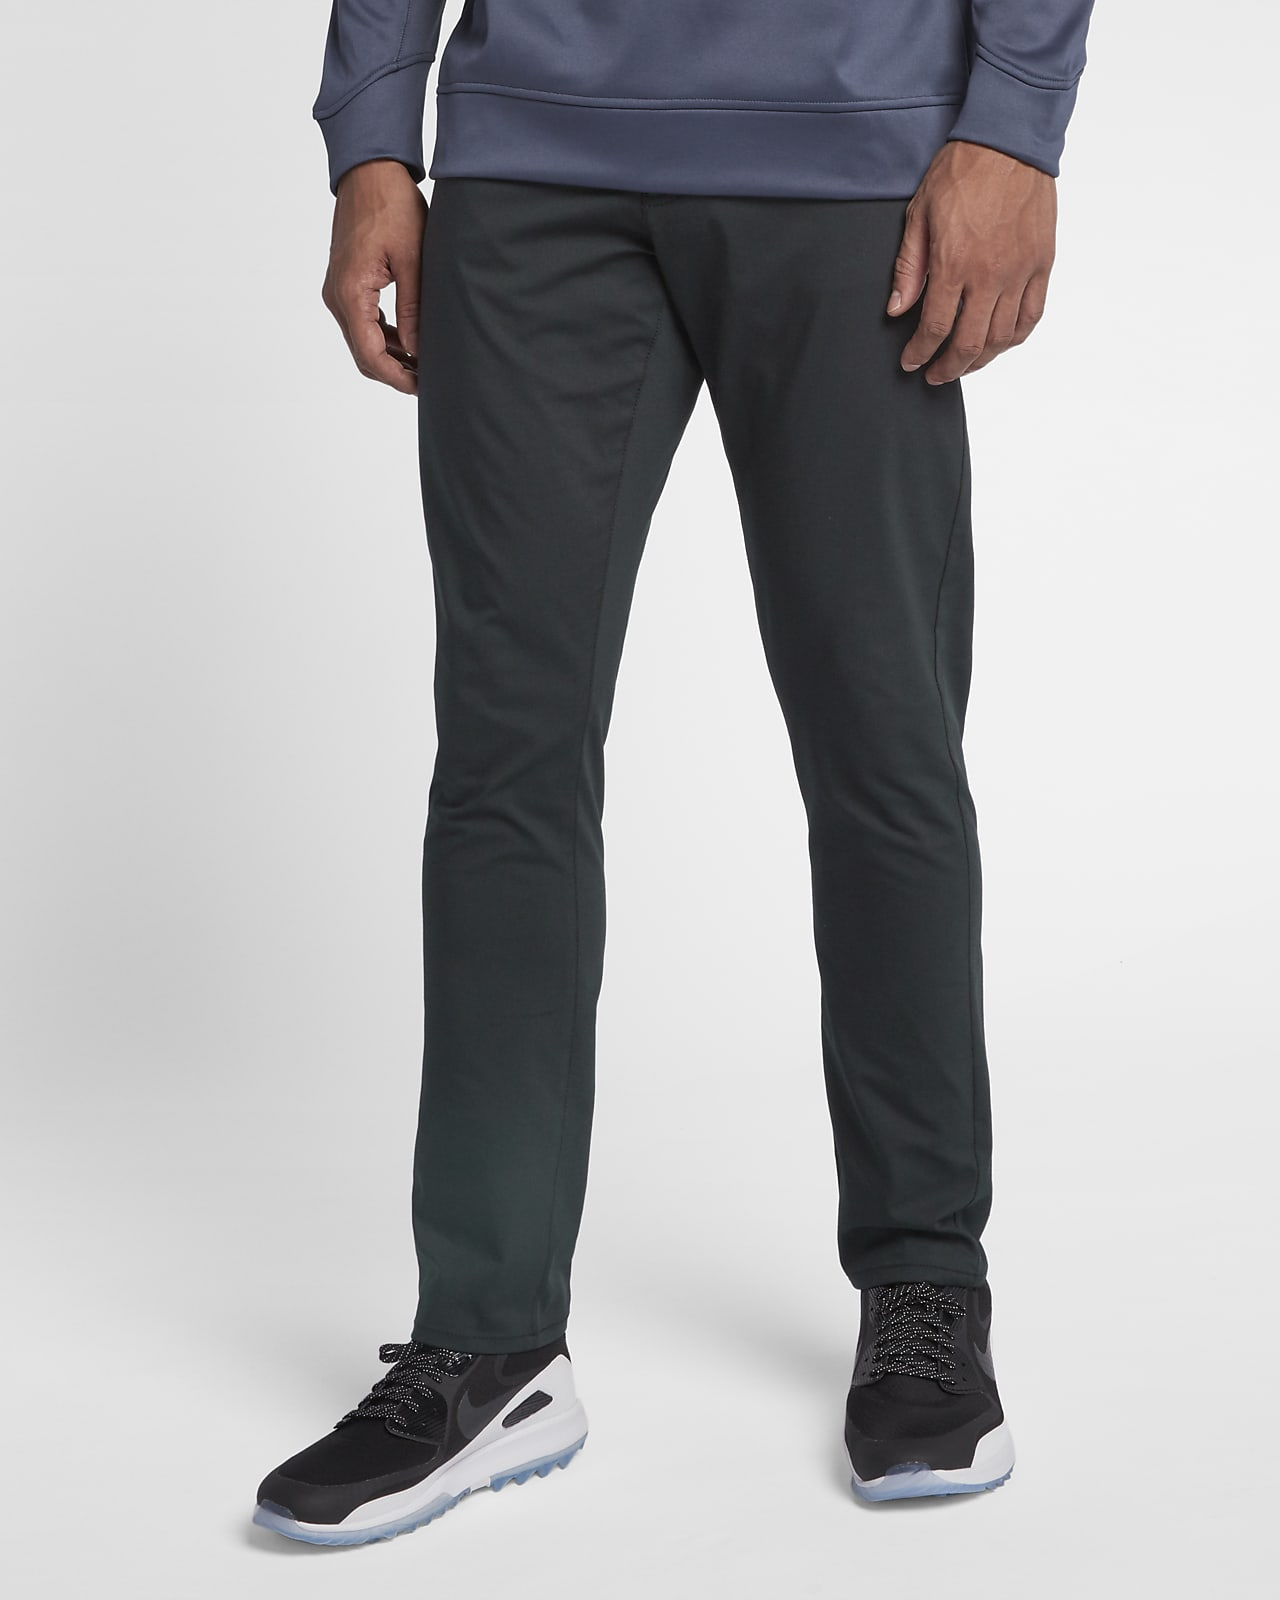 Nike Flex 5 Pocket Herren-Golfhose in schmaler Passform